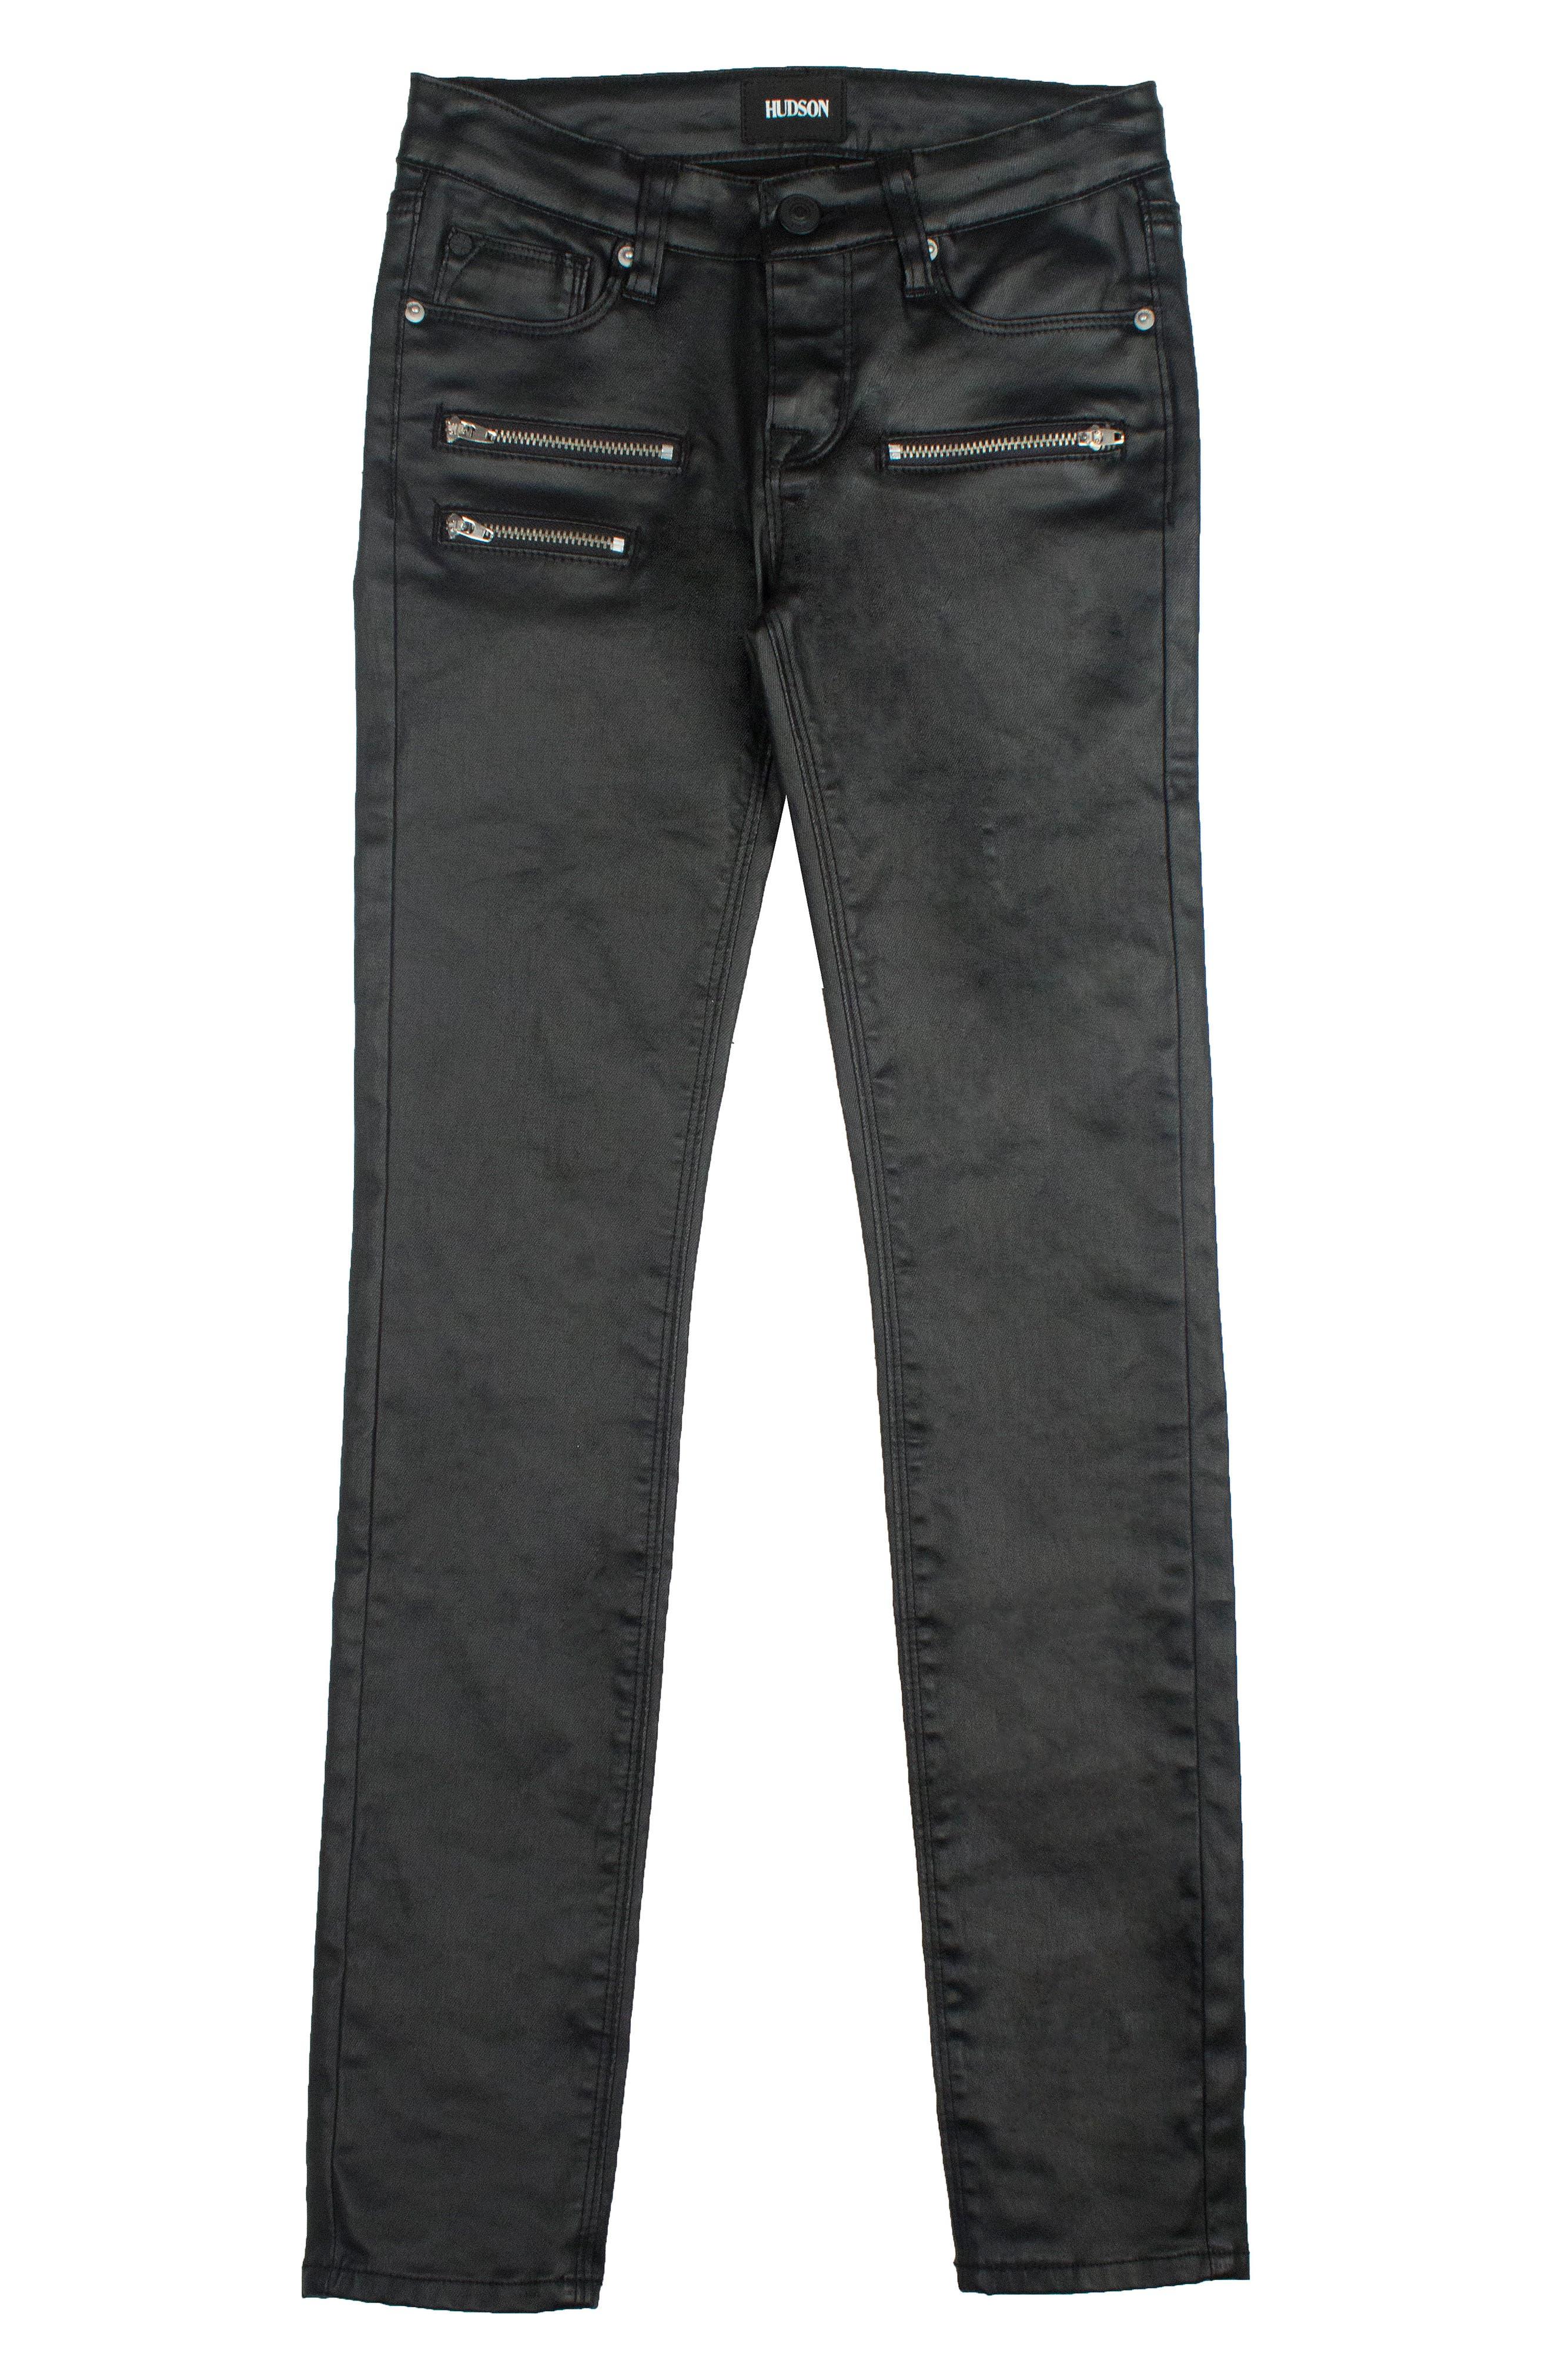 HUDSON KIDS Ziggy Skinny Jeans, Main, color, 003